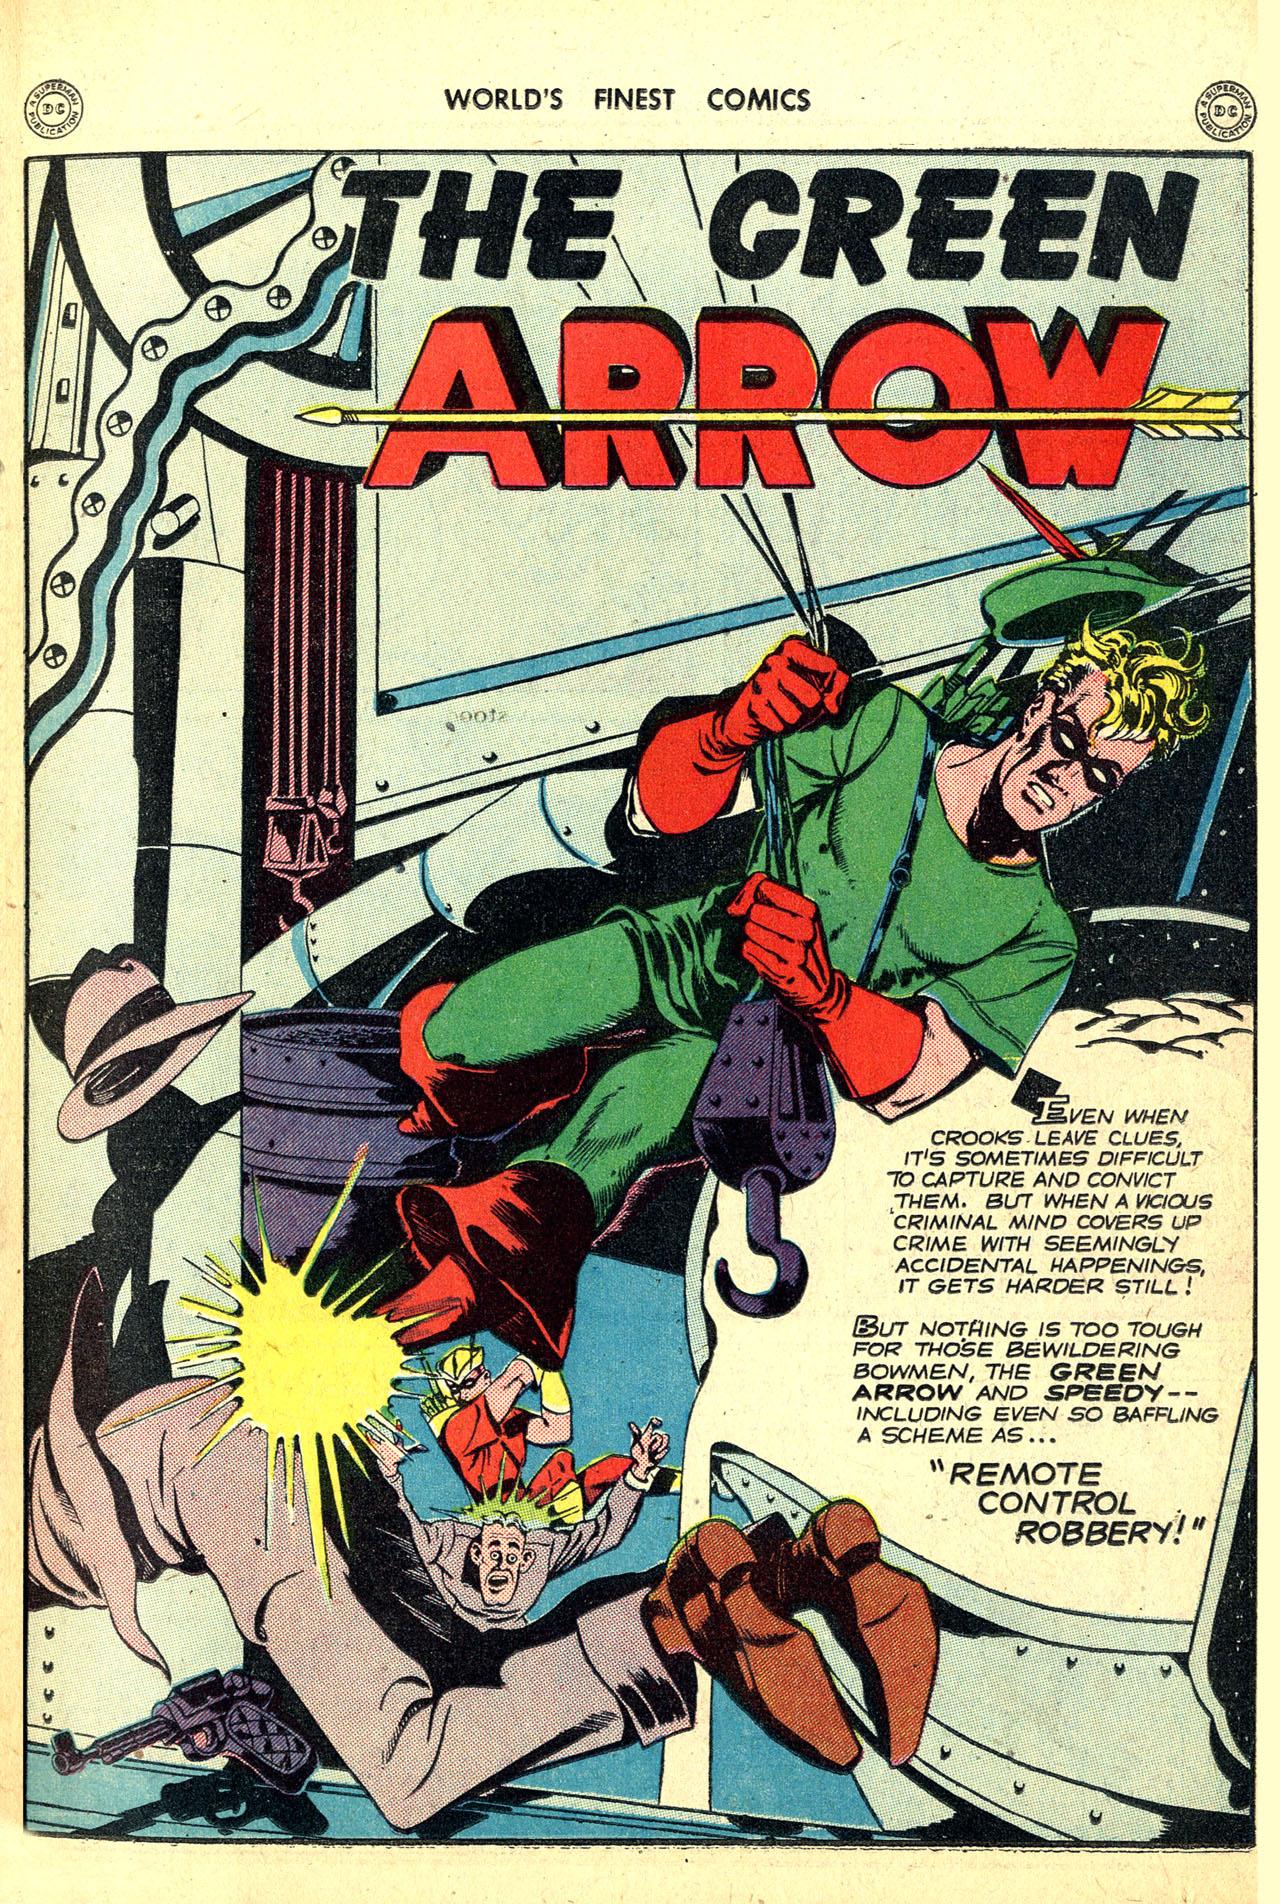 Read online World's Finest Comics comic -  Issue #18 - 49